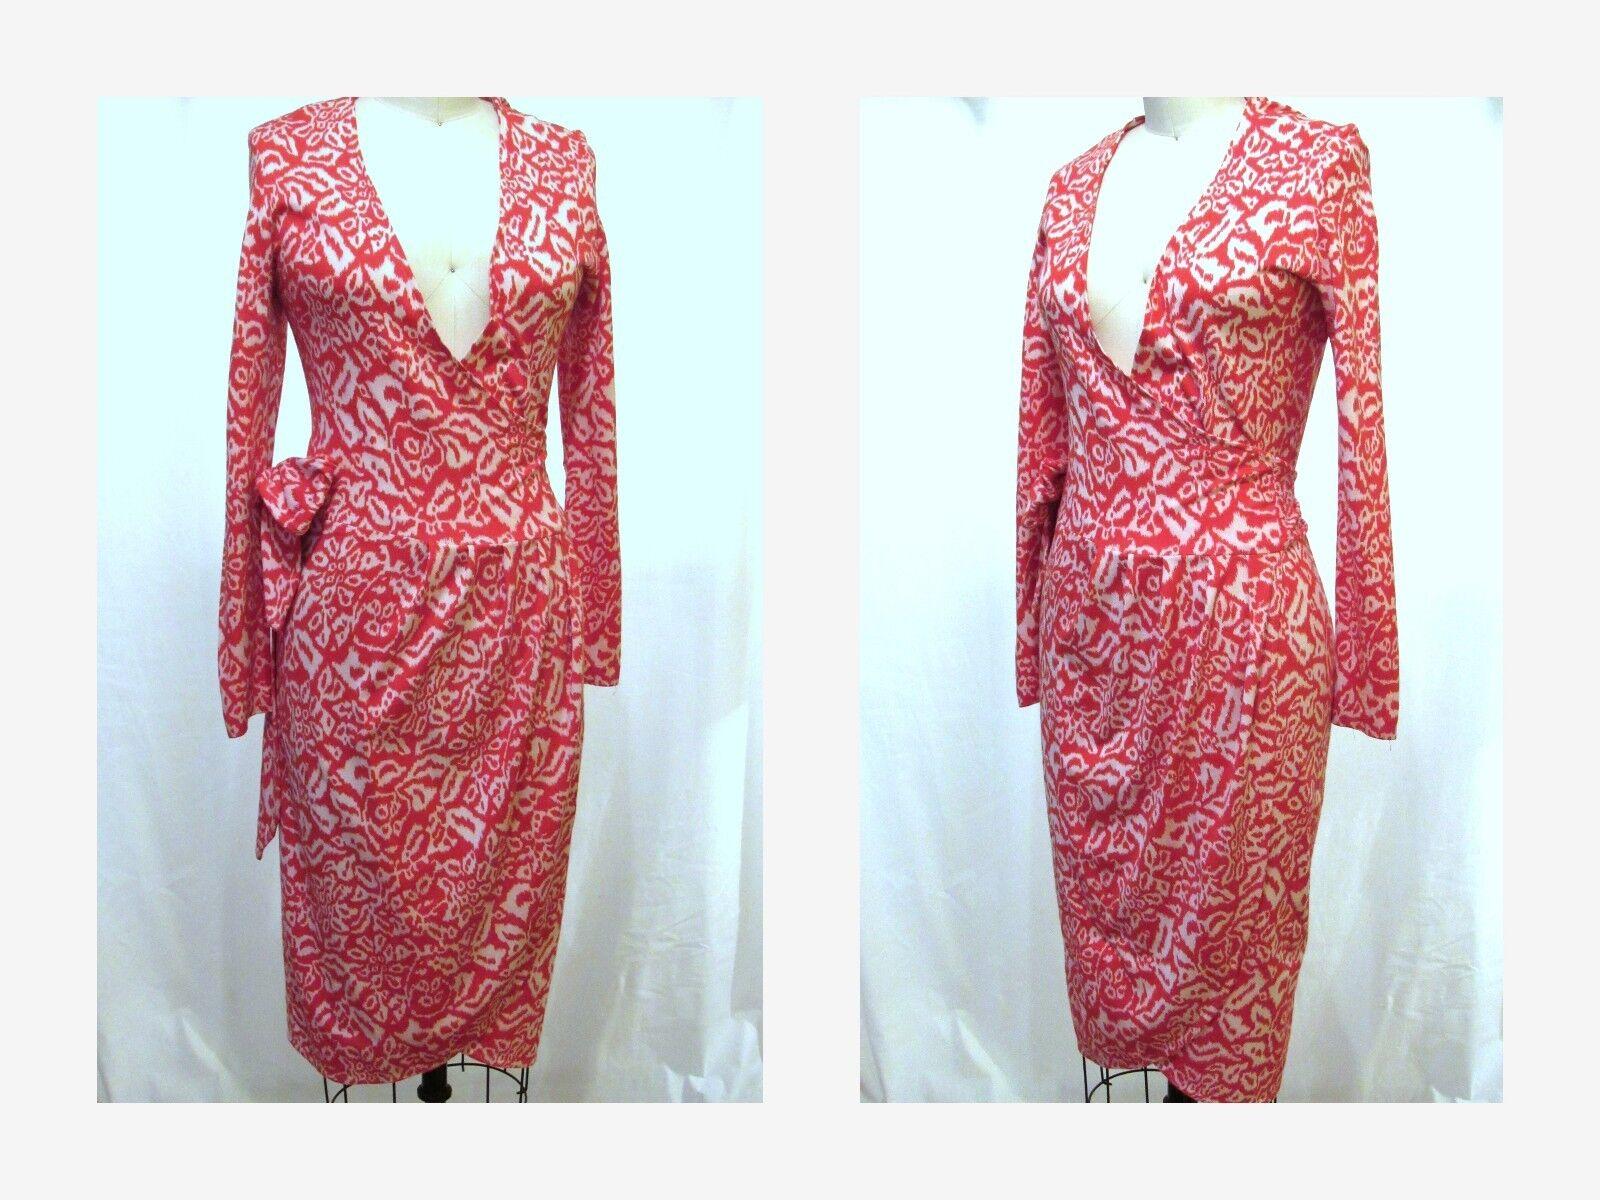 DIANE VON FURSTENBERG Vintage Wrap Dress rot and Weiß Geometric Print Sz.XS  S